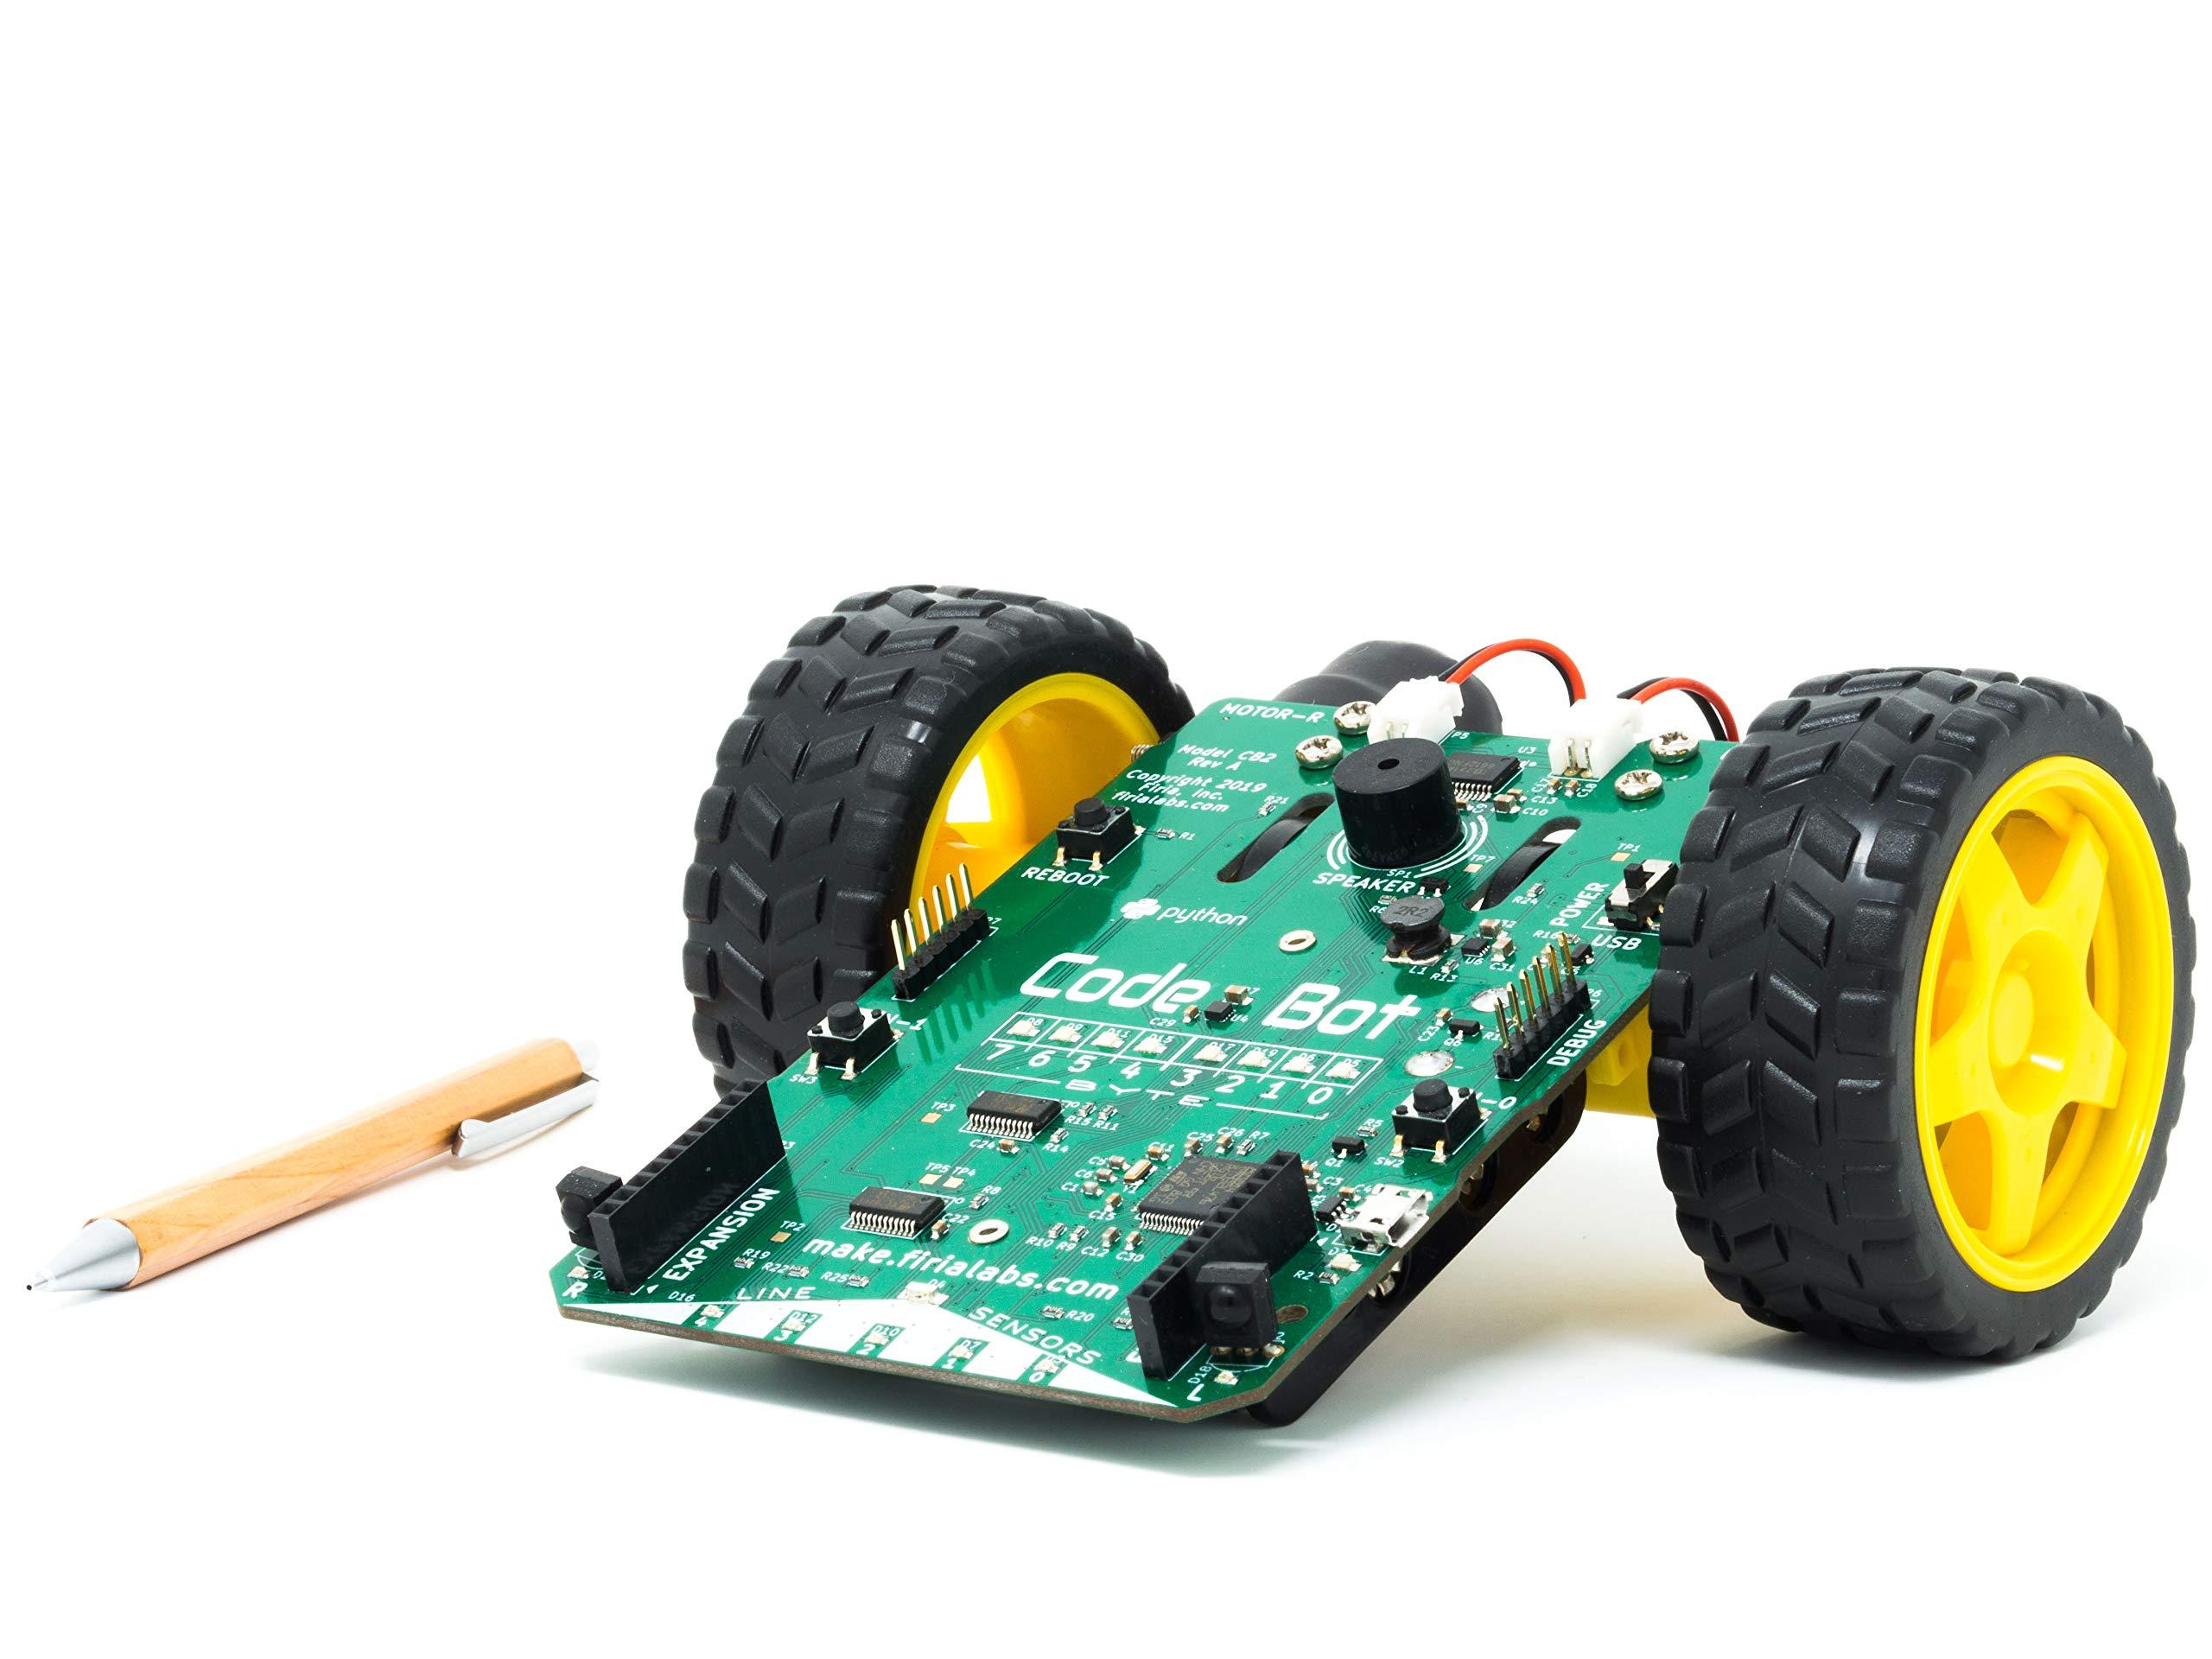 Robot Educativo para armar y programar Python Firya